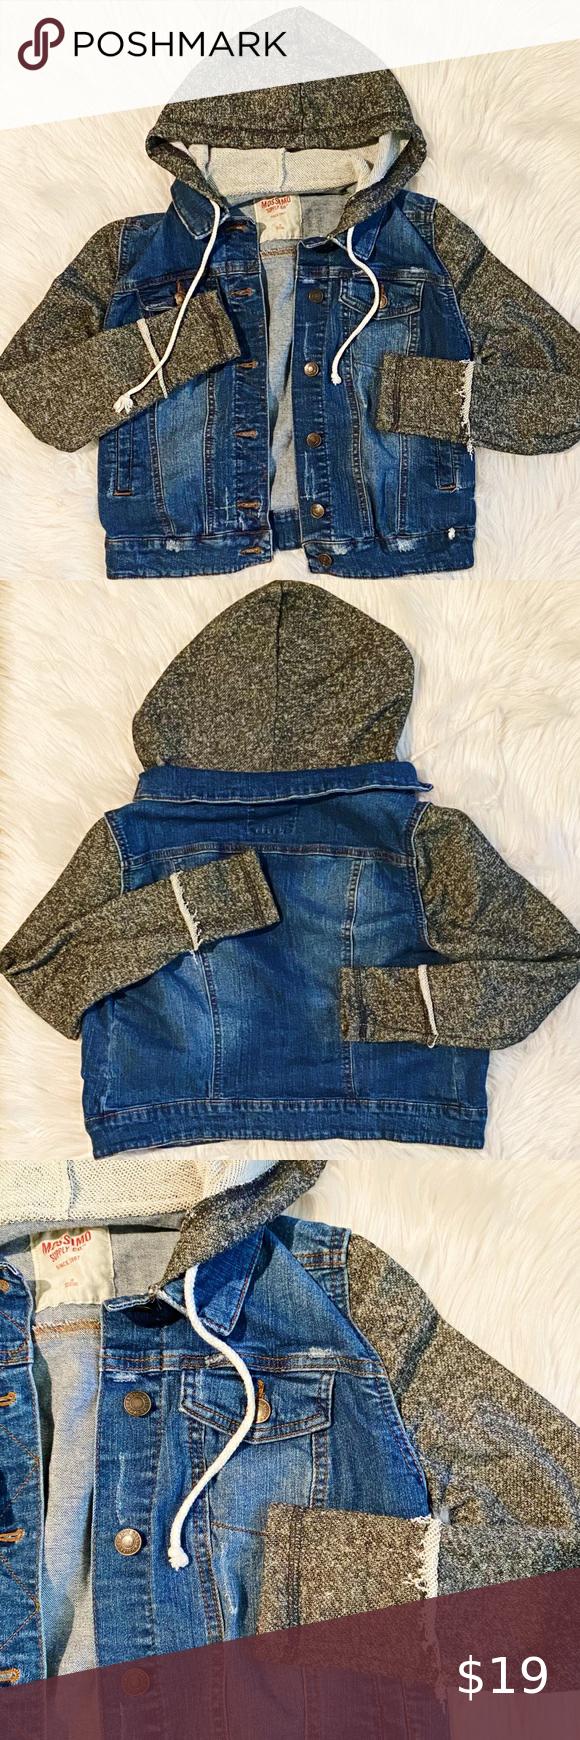 Mossimo Hoodie Jean Jacket Denim Grey Small Jean Jacket Hoodie Denim Jacket Jean Jacket [ 1740 x 580 Pixel ]